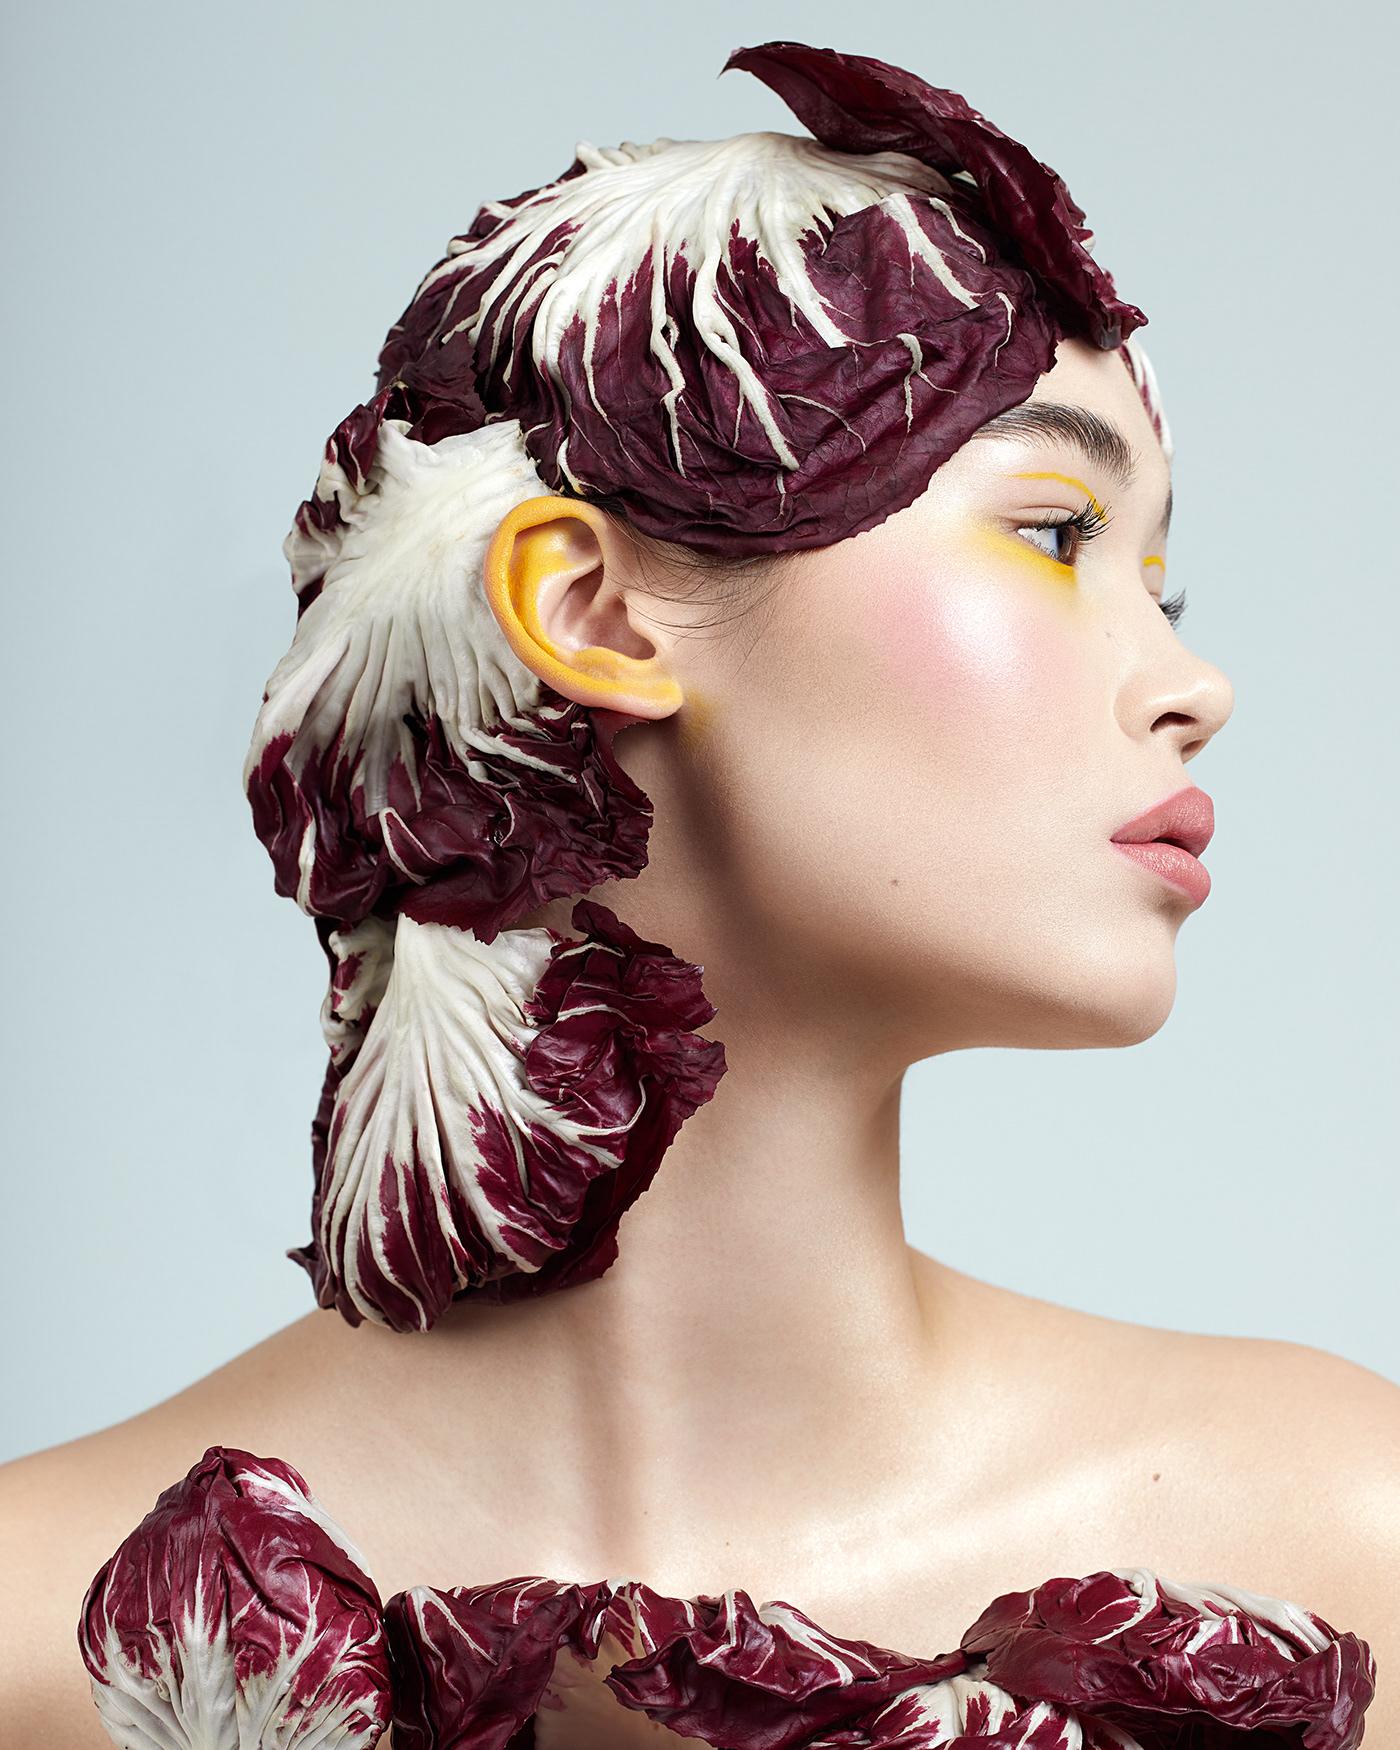 beauty Behance Canada Fashion  hair makeup Photography  retouching  studio styling